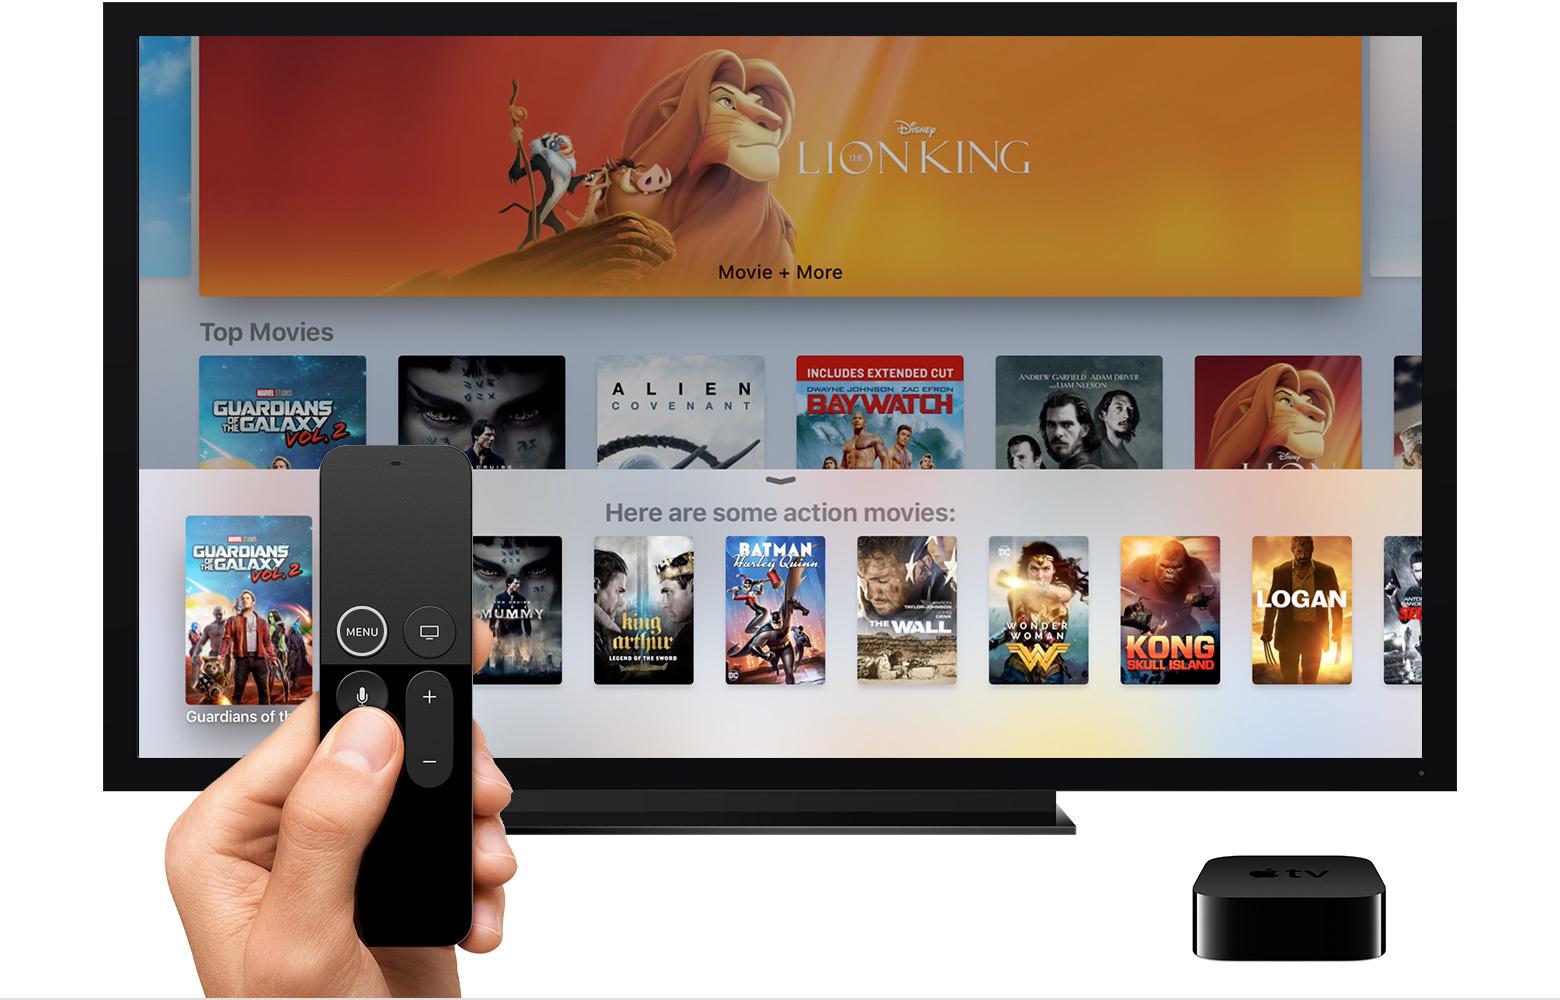 tvos11-apple-tv-siri-search-hero.jpg